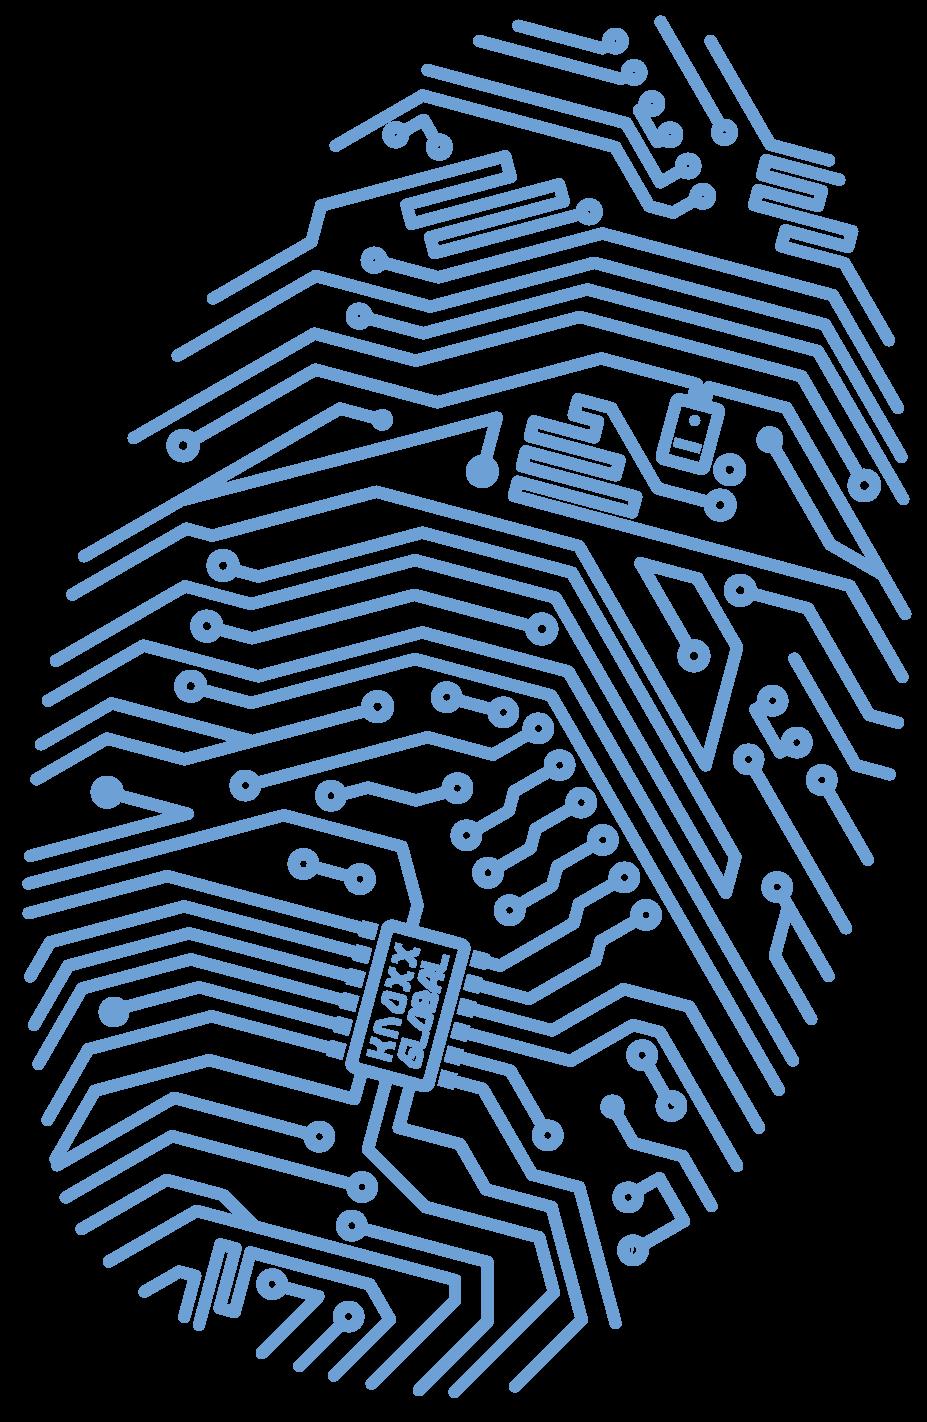 fingerprint logo - بحث Google | Soyoli store launch event